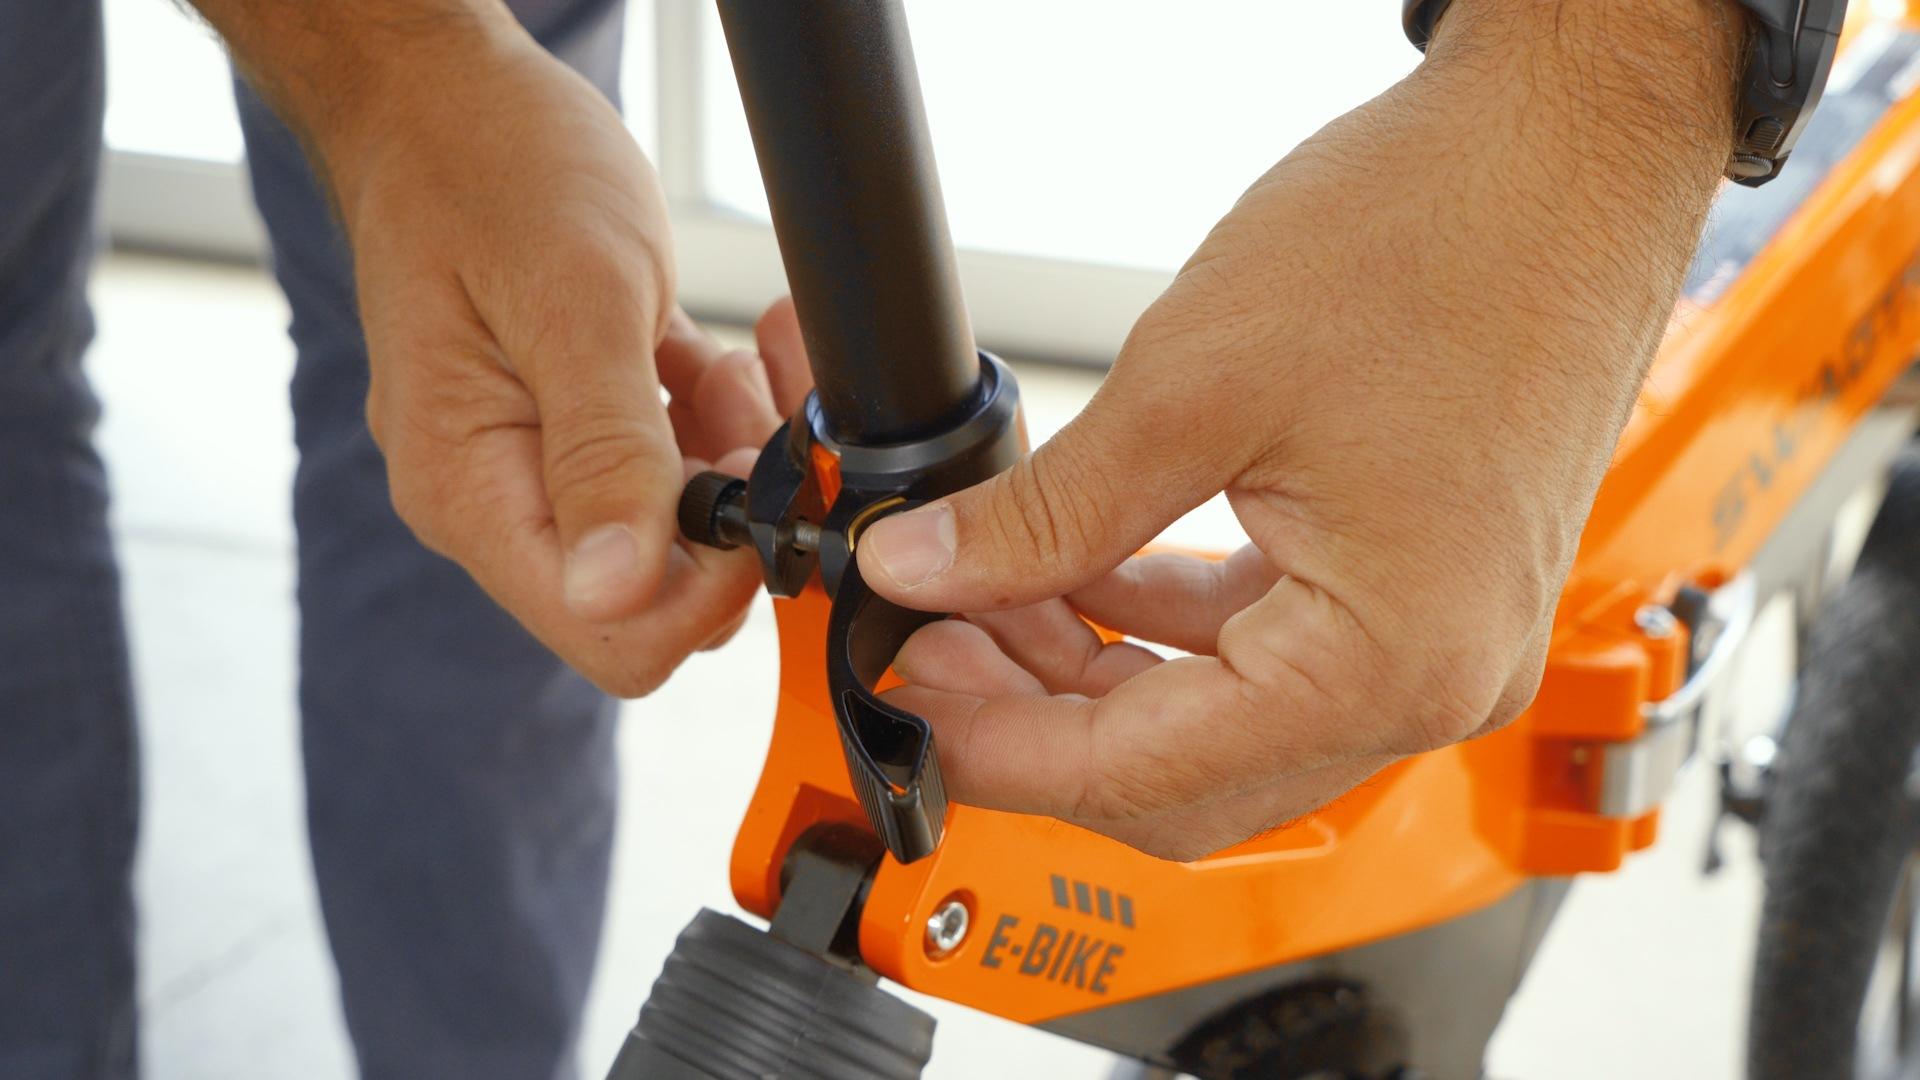 Closeup of man tightening the seat clamp.